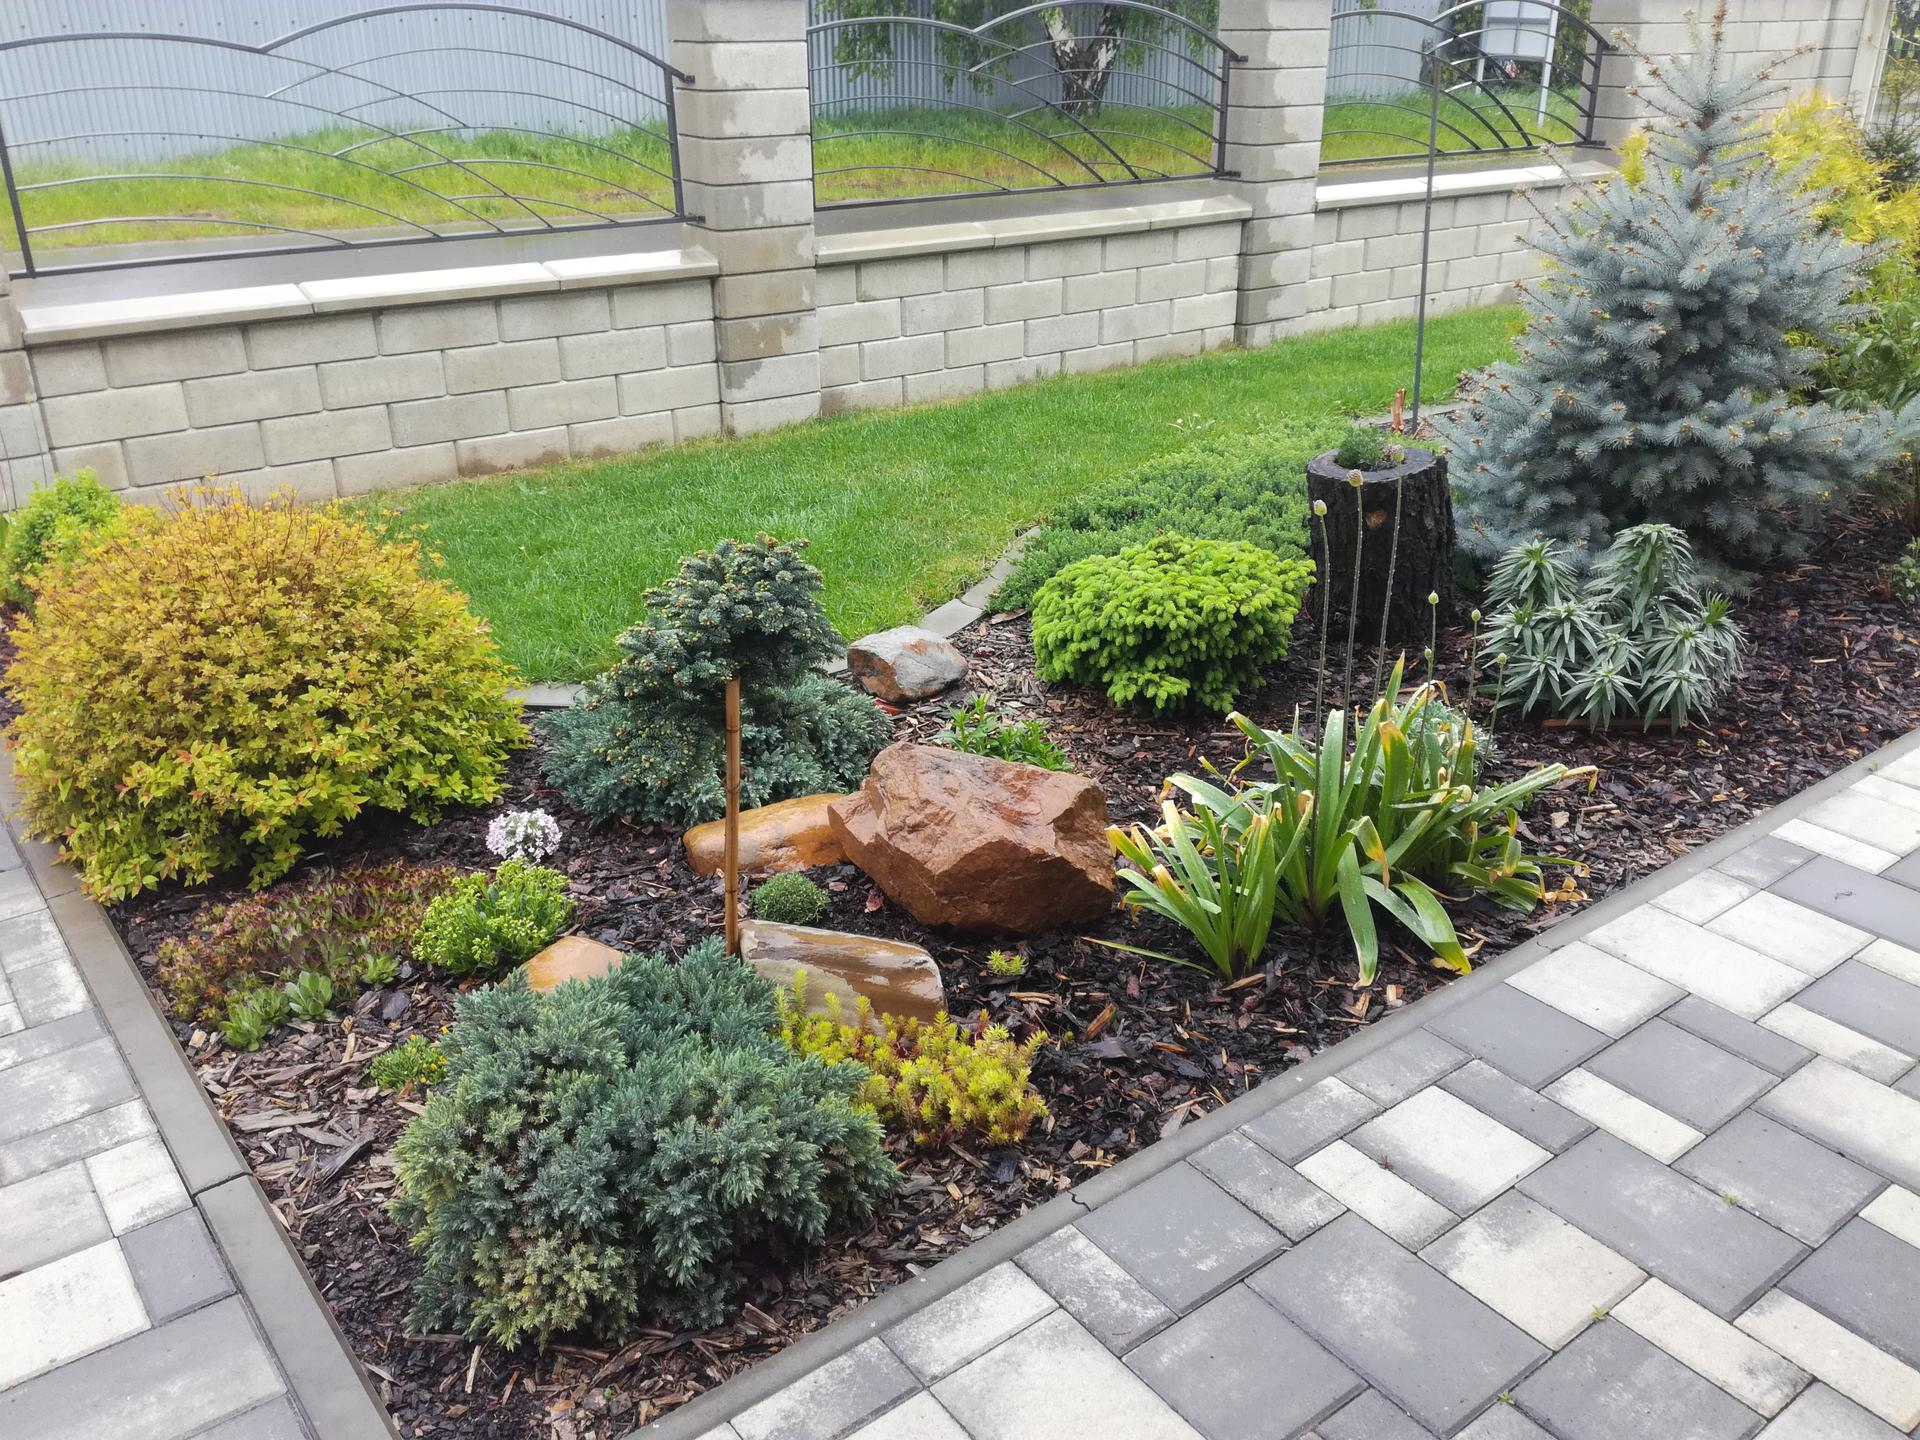 Zahrada 2021 🌲 - Obrázek č. 57